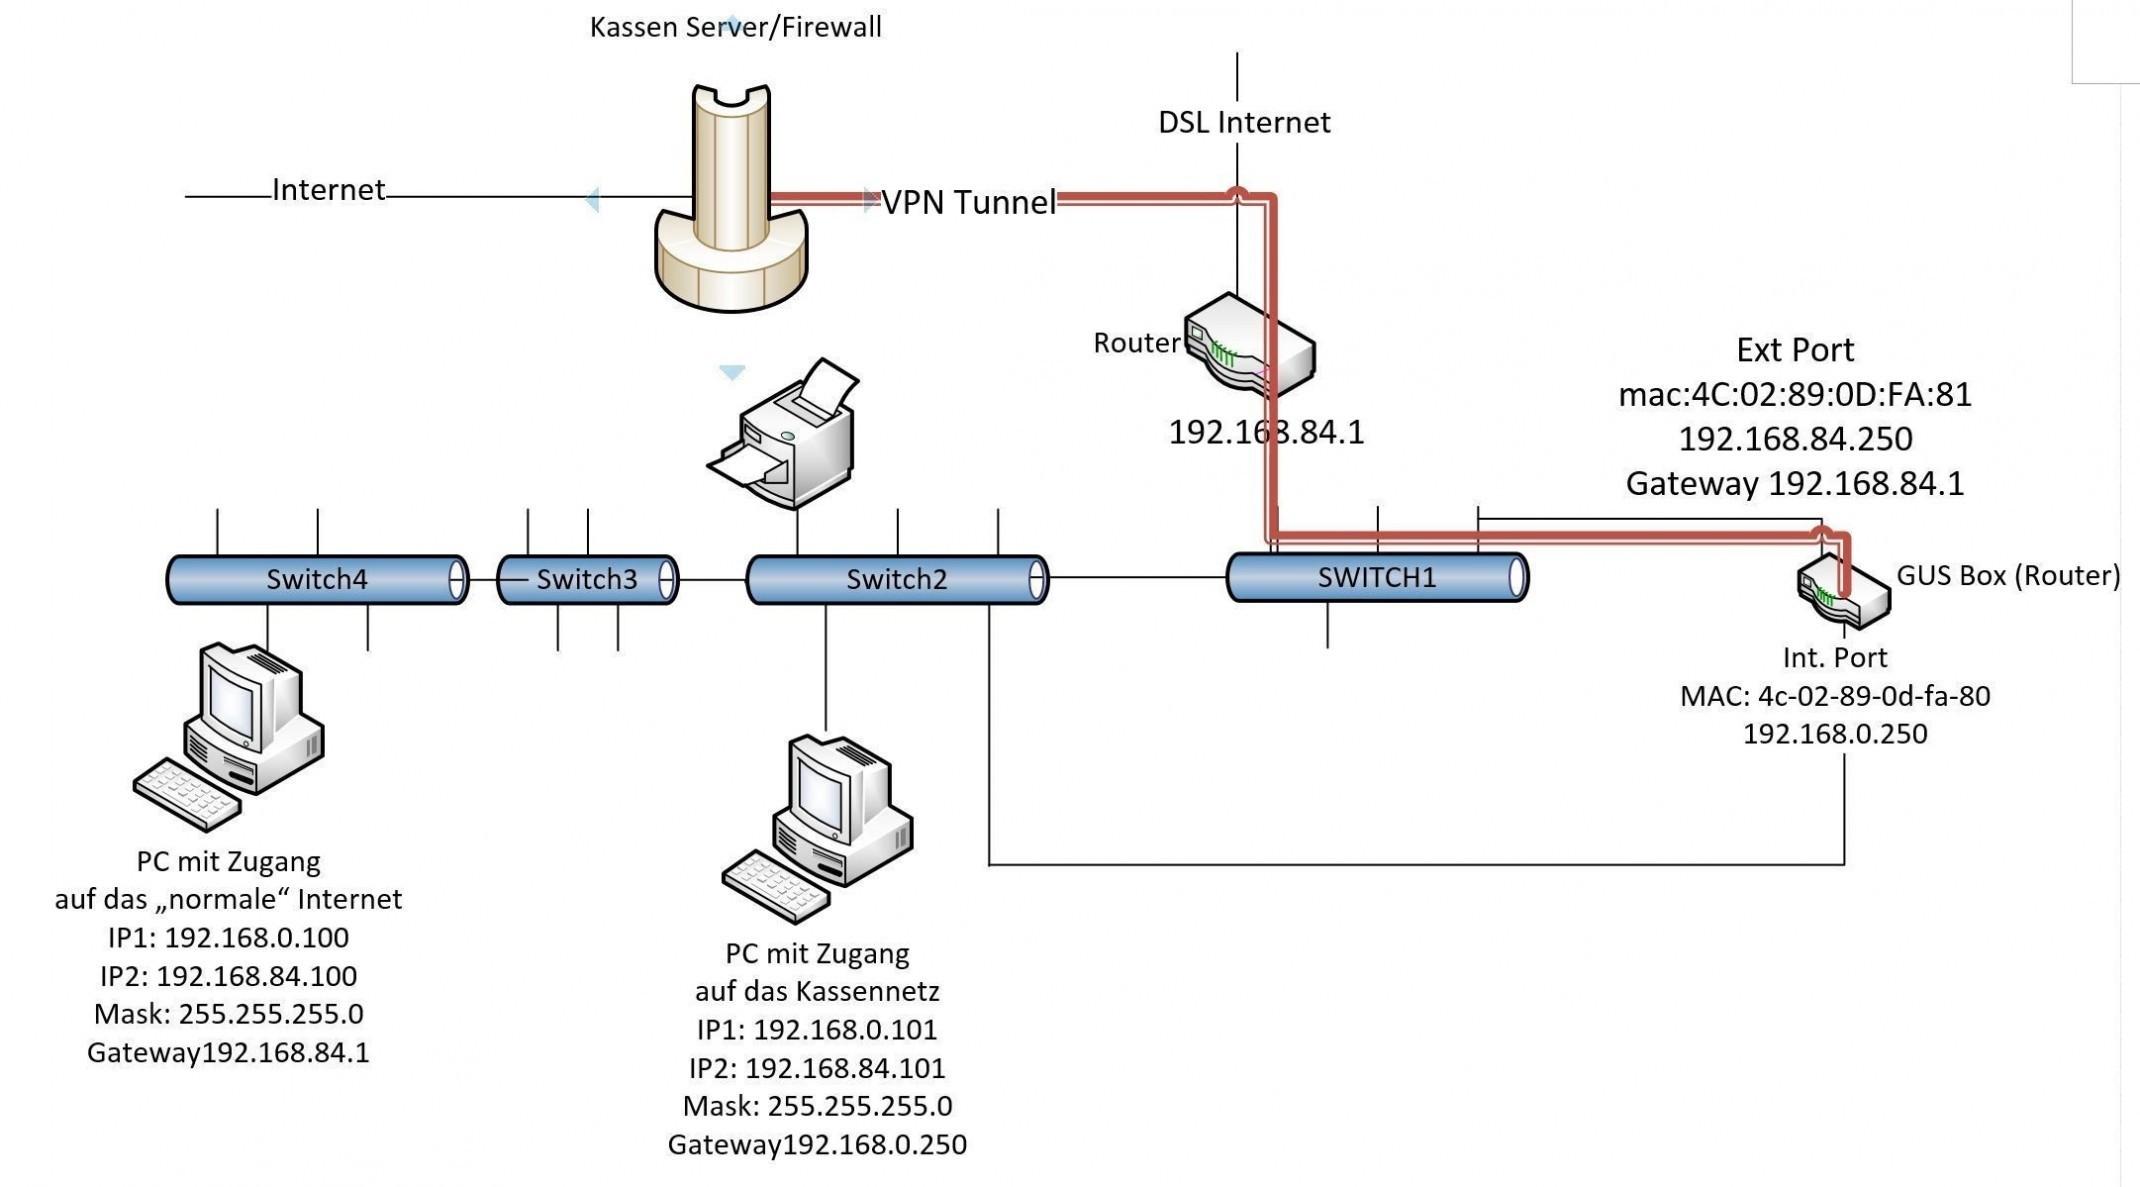 Car Amplifier Diagram Wiring Diagram Car Amplifier New Boat sound System Wiring Diagram Of Car Amplifier Diagram